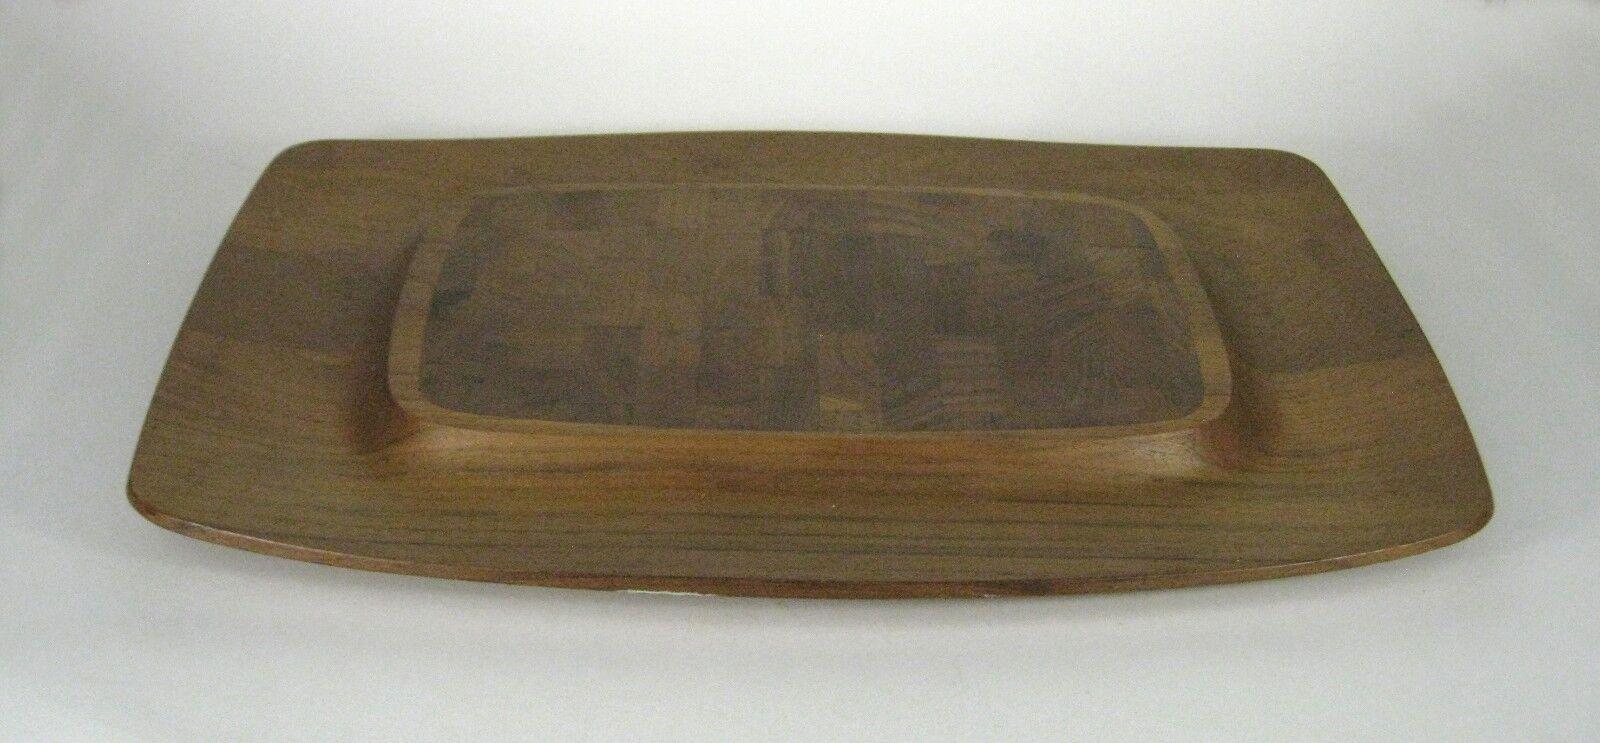 Dansk Cutting Board 18 In Teak Wood Cheese Bread Denmark IHQ Mid Century Modern